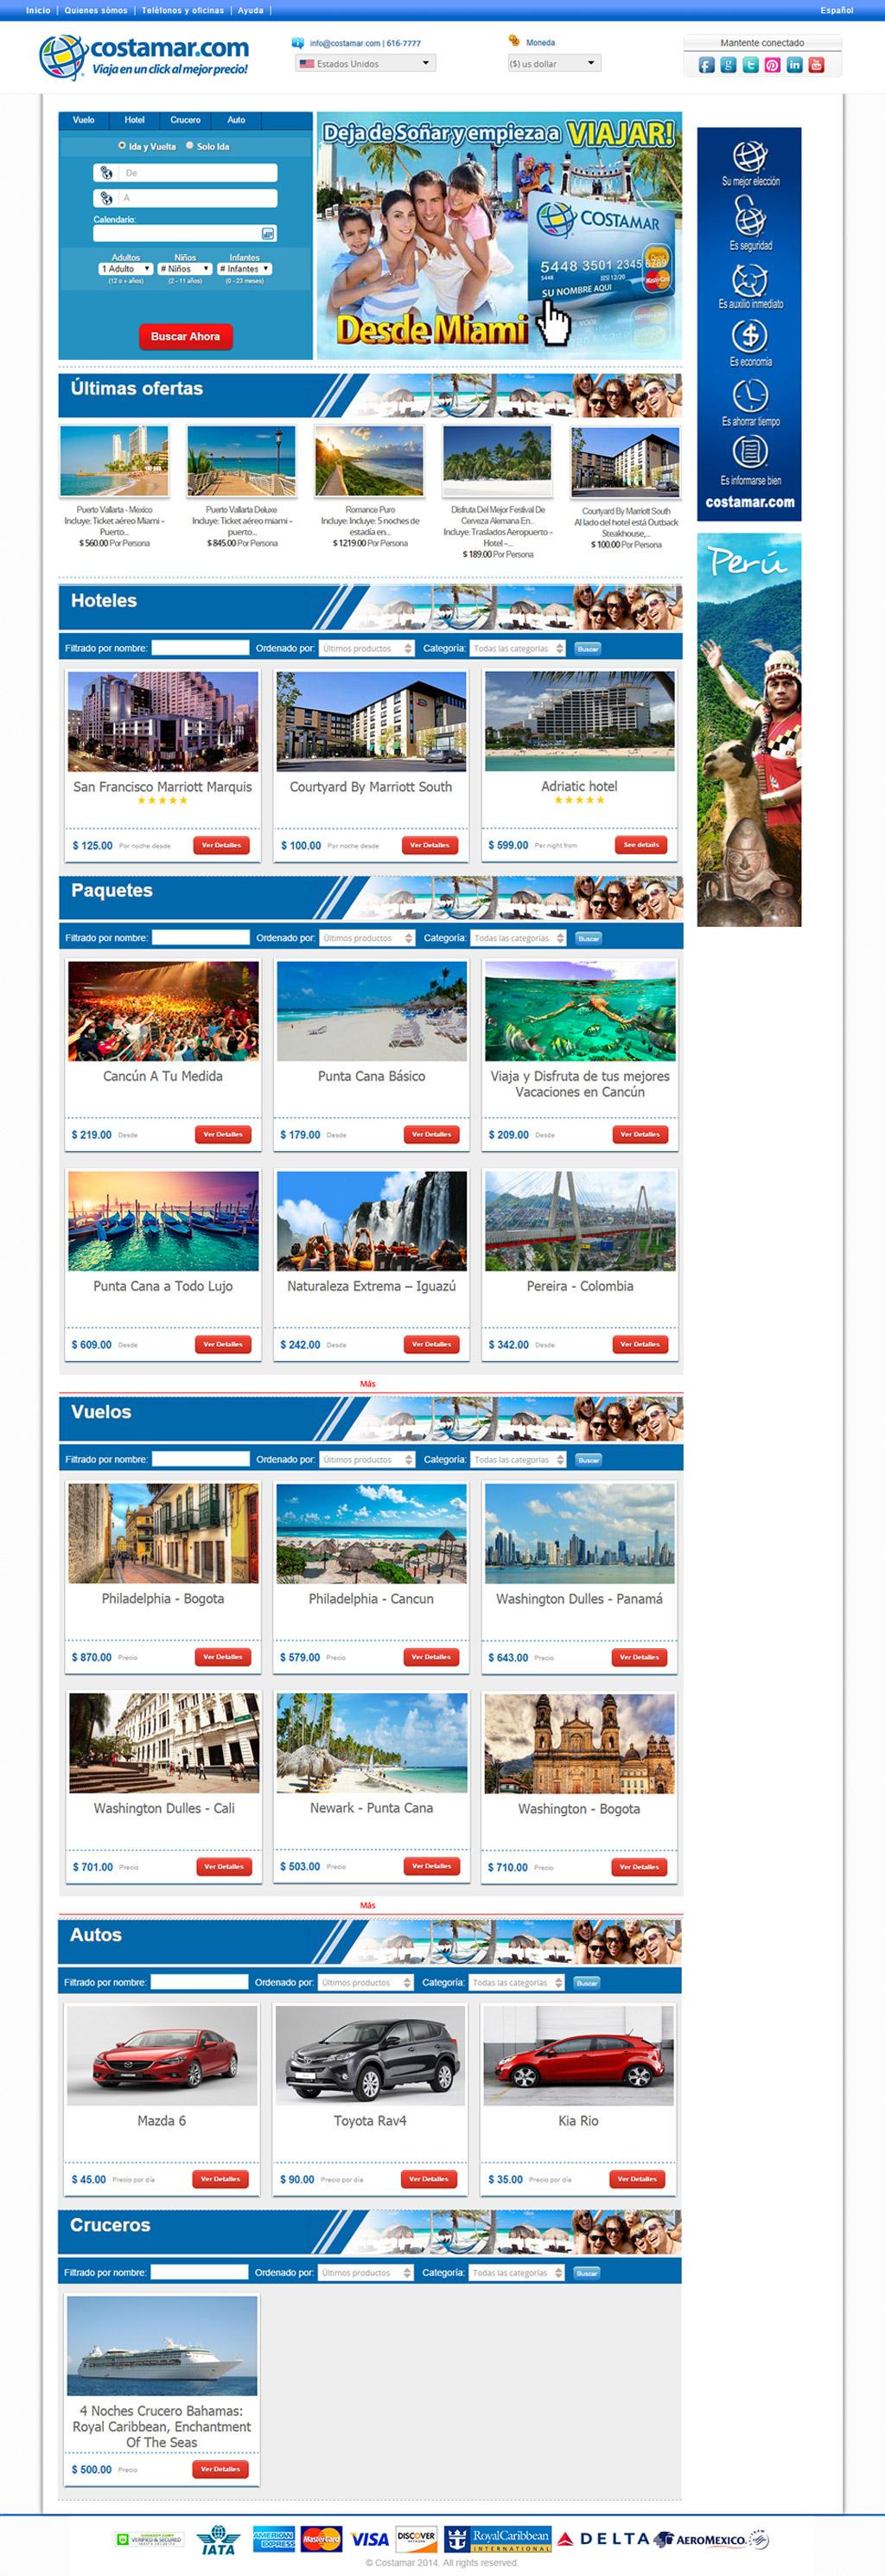 Costamar Travel Homepage Design